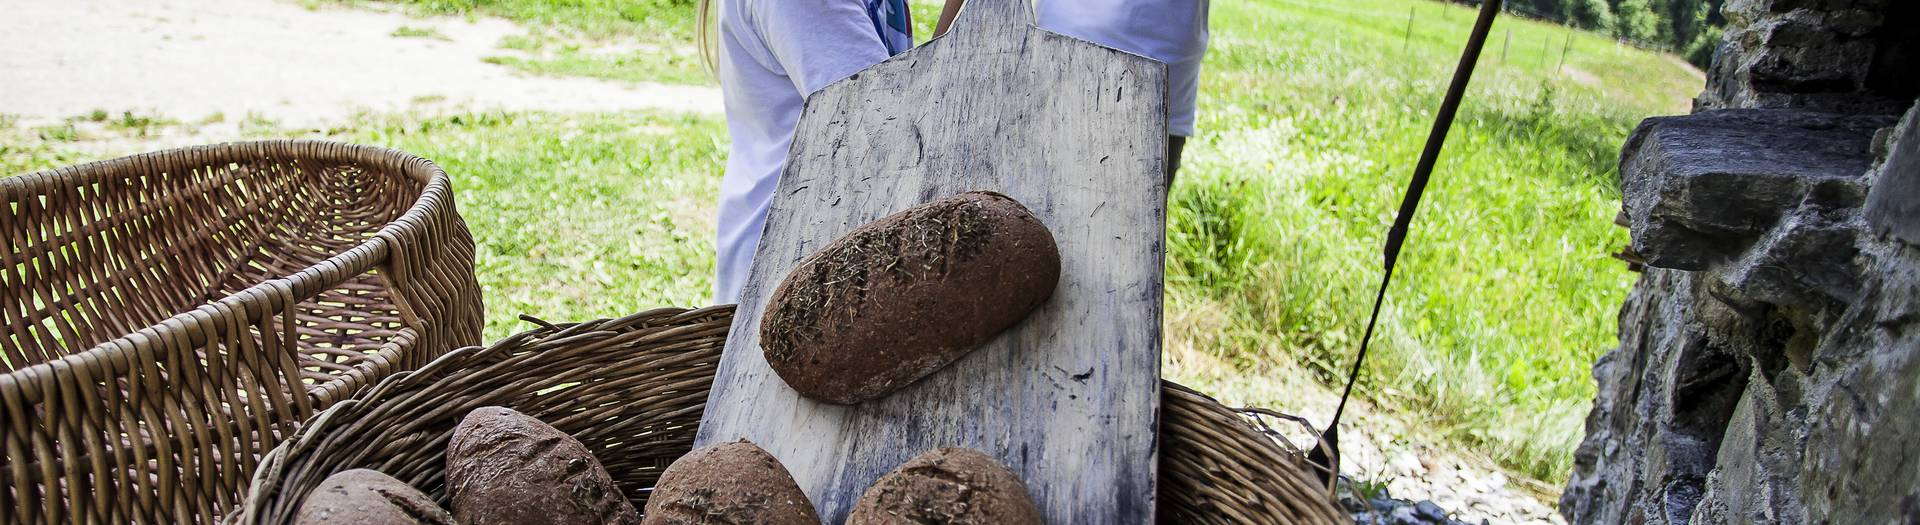 Geschmack der Kindheit - Brot backen Lesachtal